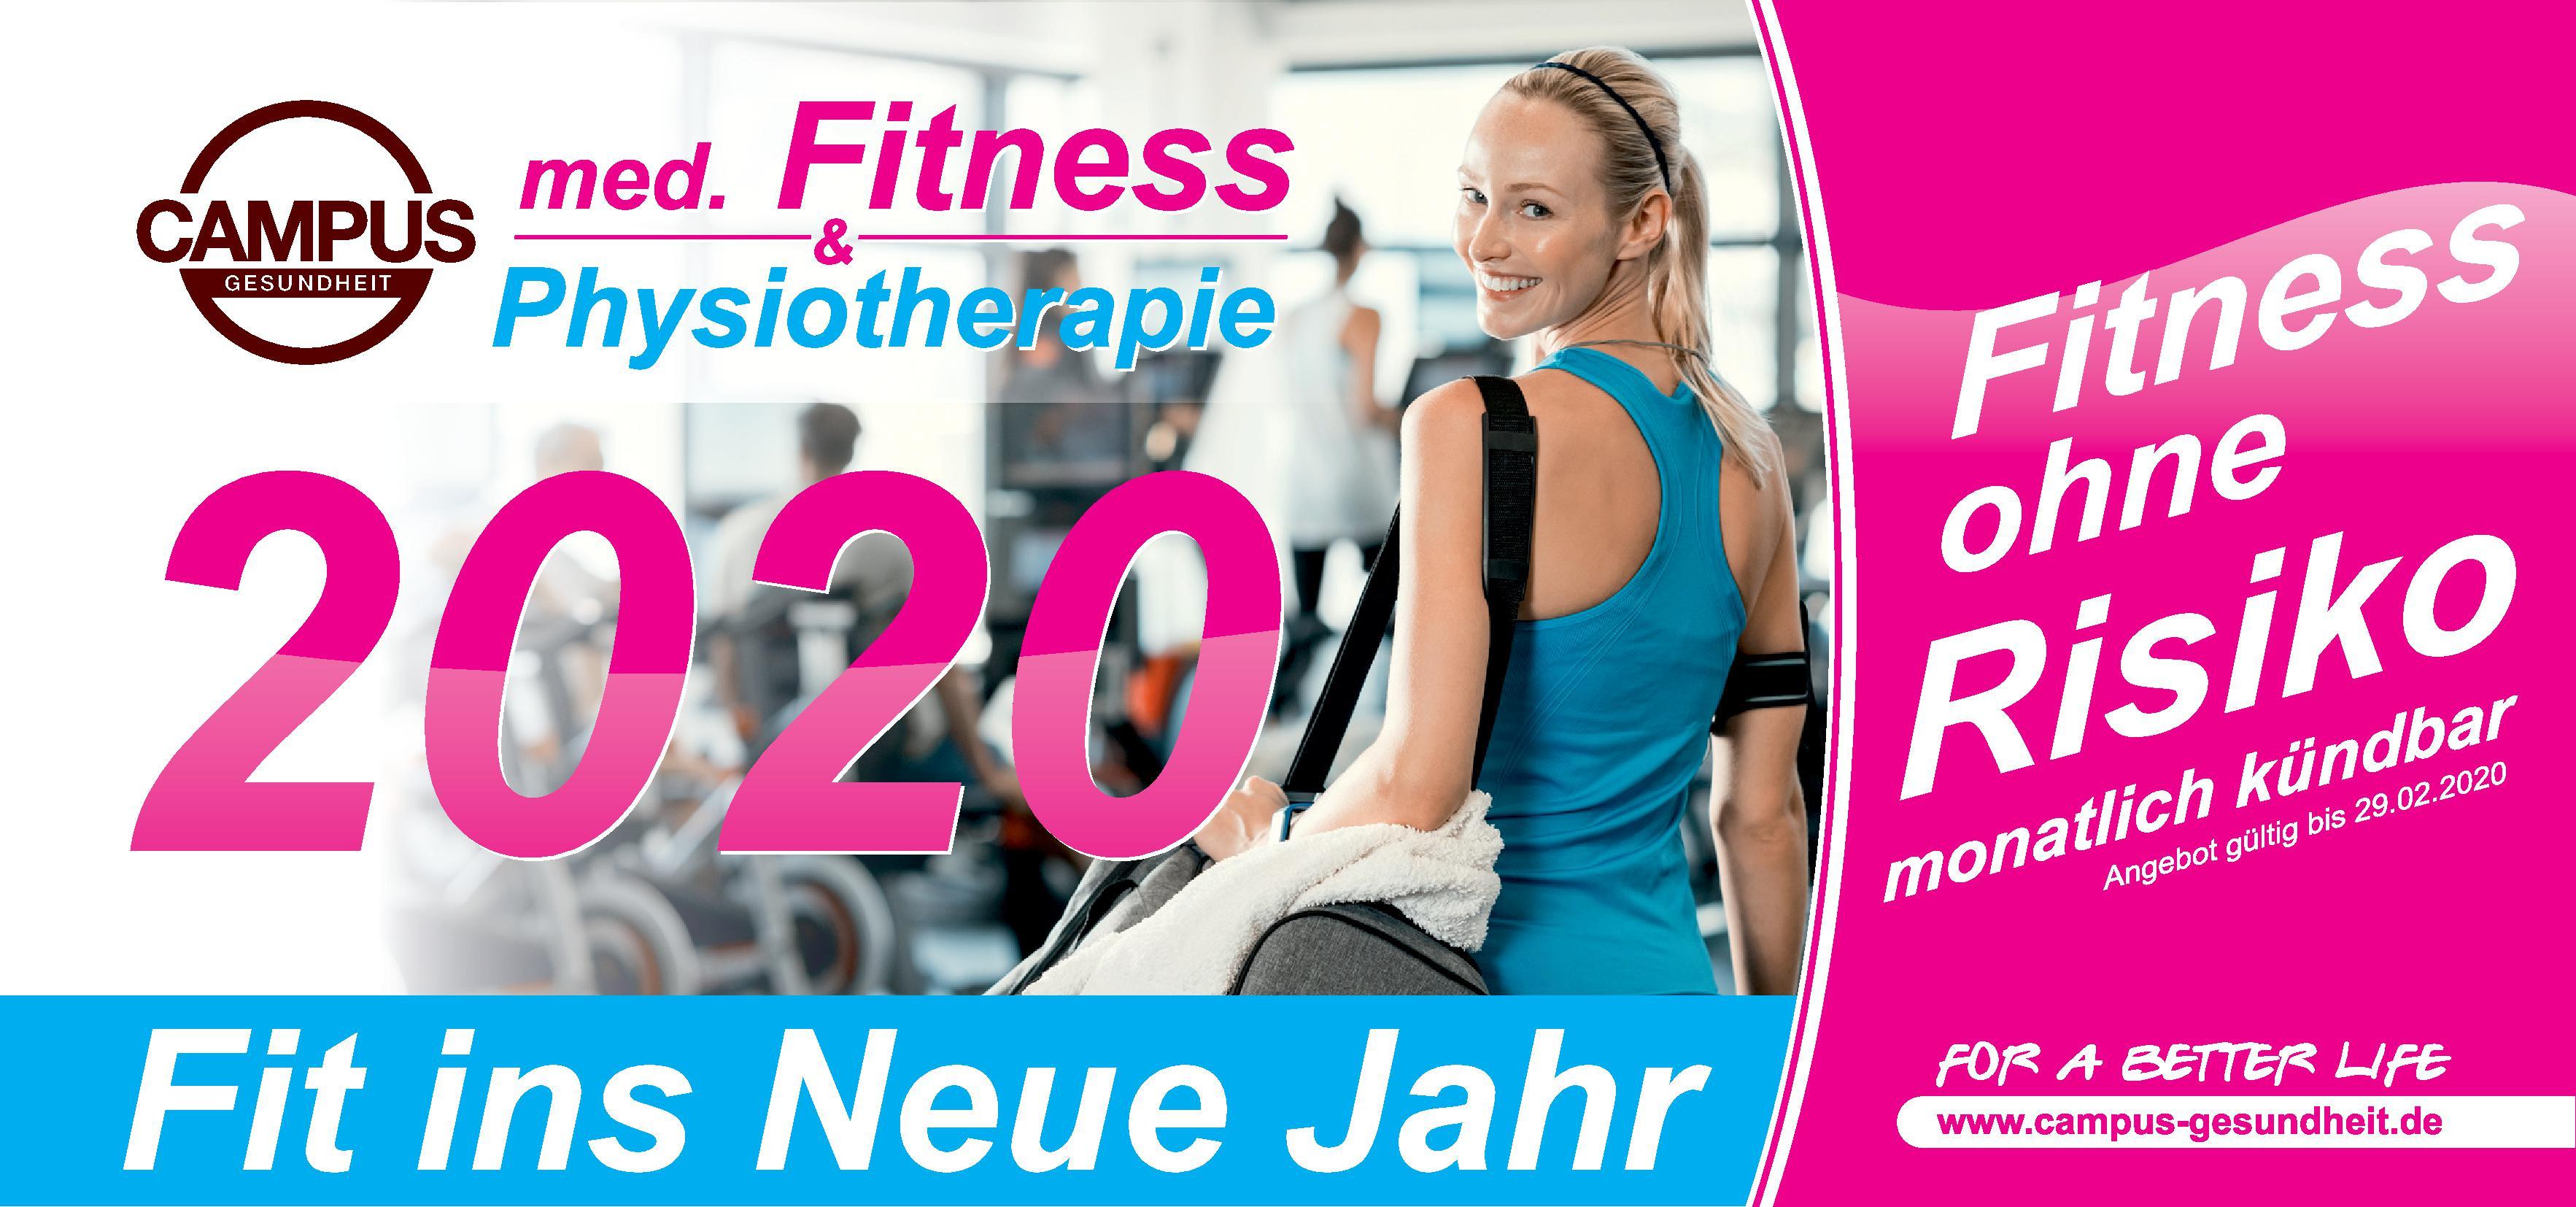 Campus Fitness Nürnberg monatlich kündbar 1